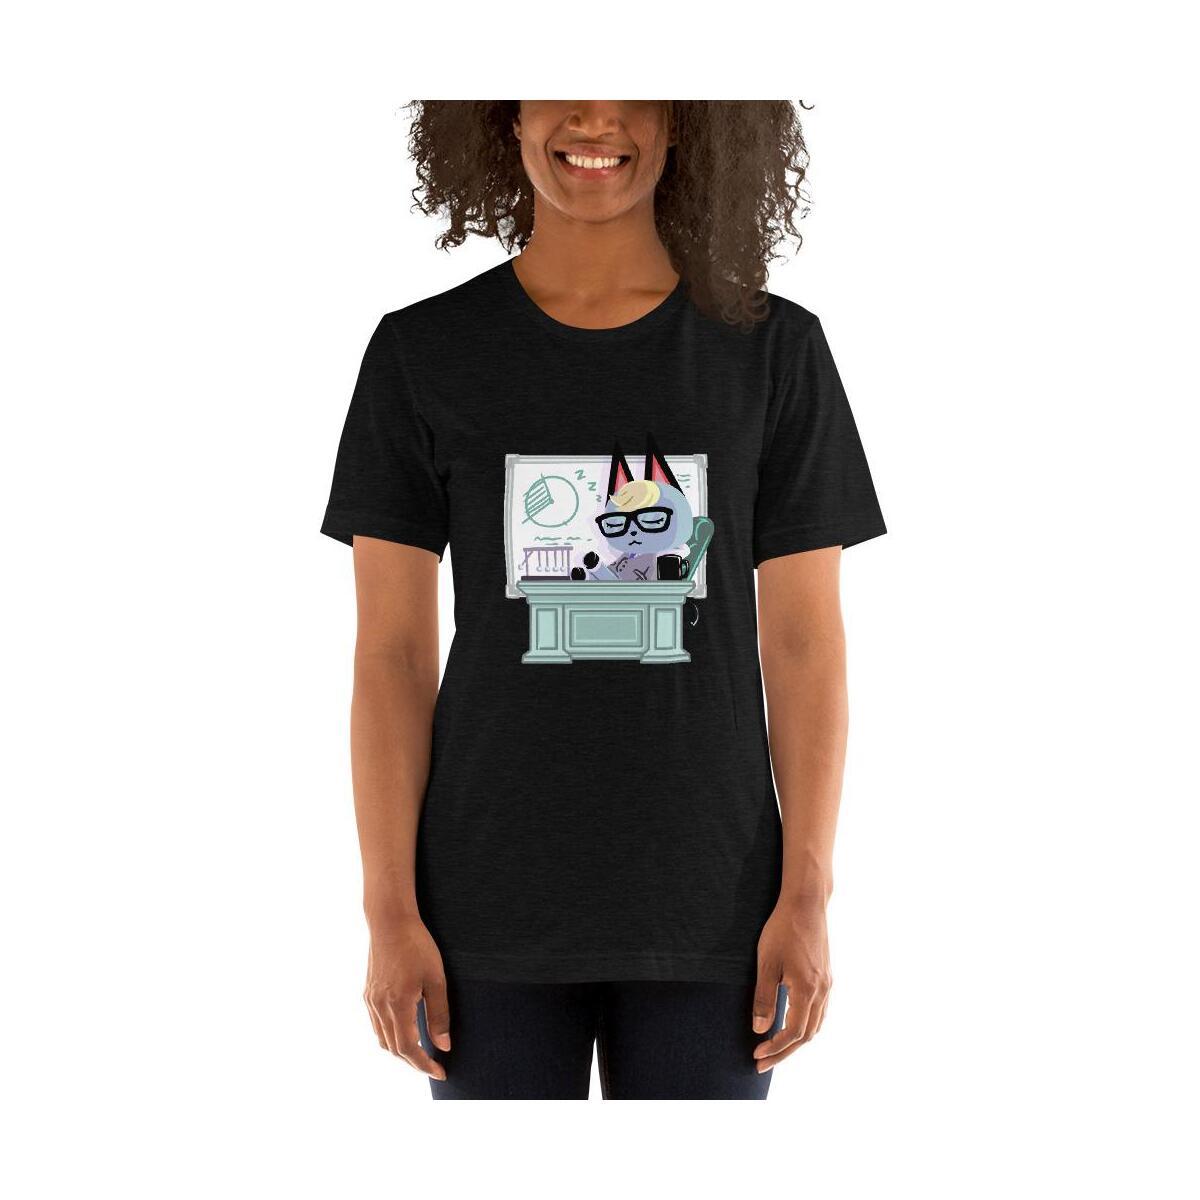 Animal Crossing Raymond Busy Workday Short-Sleeve Unisex T-Shirt, Black Heather / XS